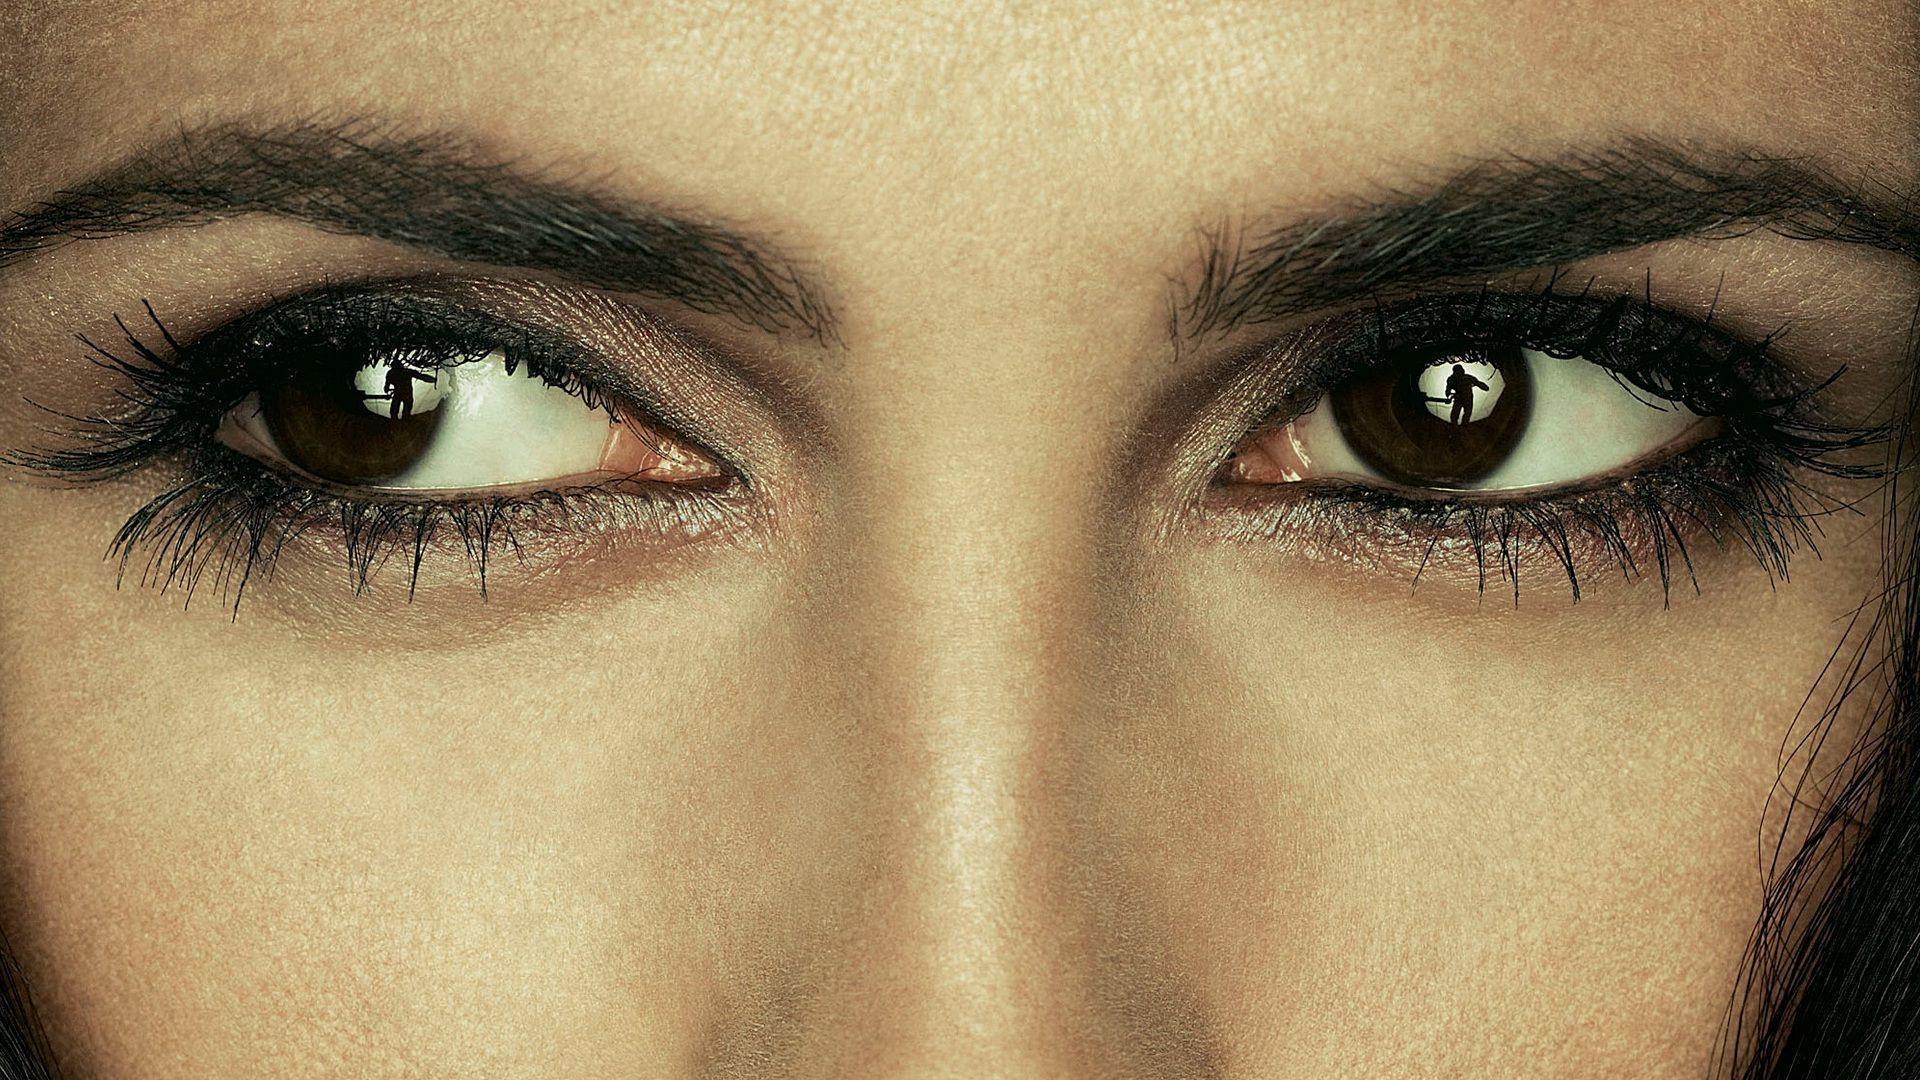 Глаза картинки или фотографии